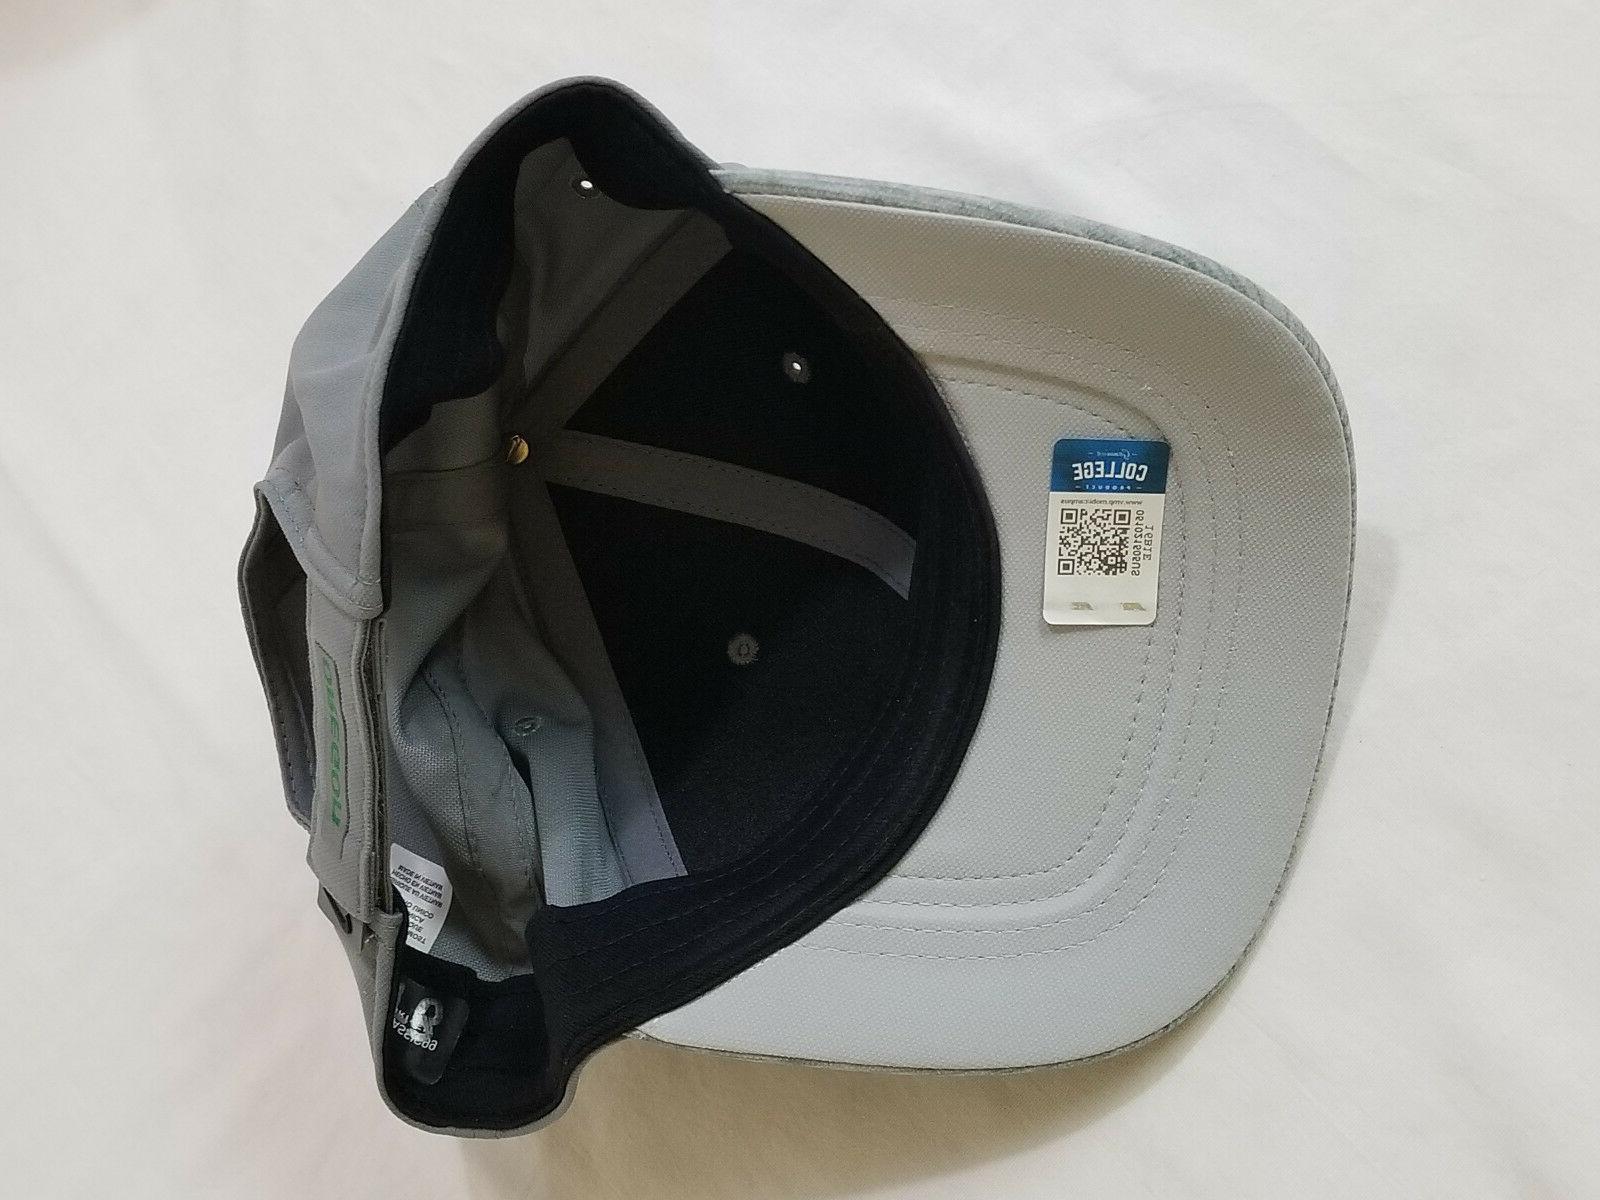 NEW 2018 TEAM-ISSUED HAT Dri-Fit Baseball CAP